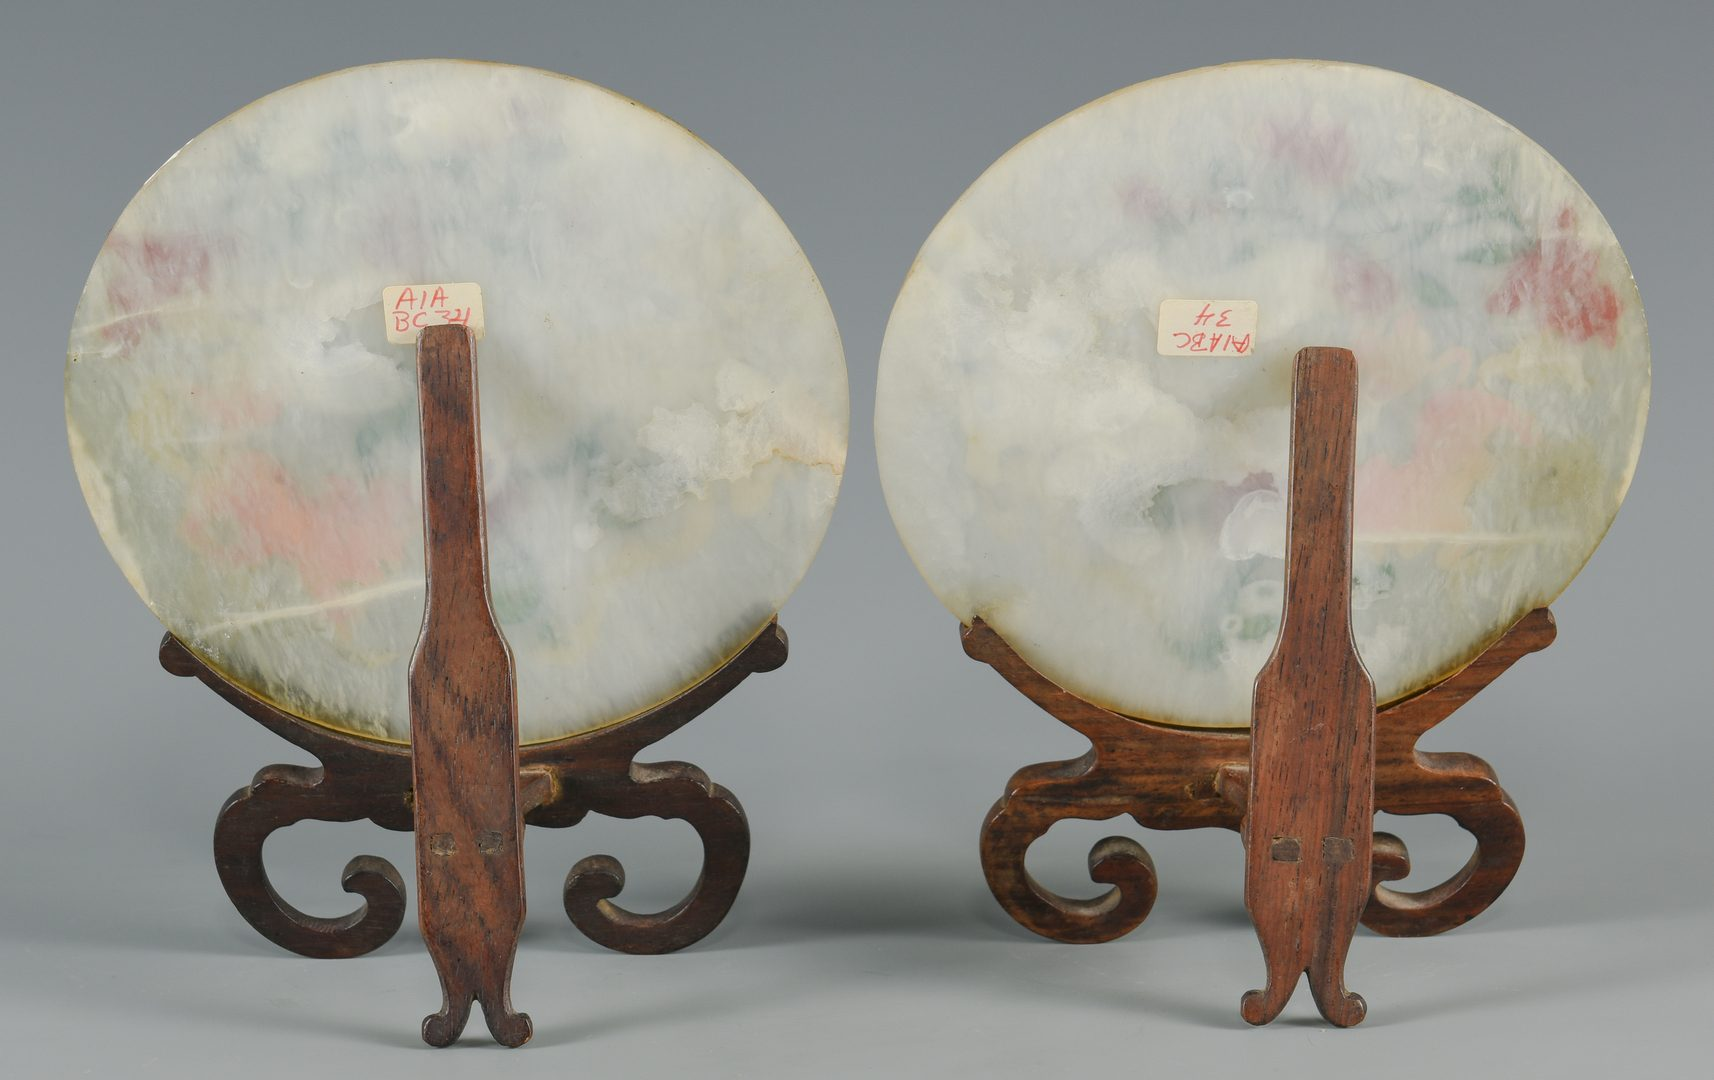 Lot 27: Pair Chinese Inlaid Jade Table Screens